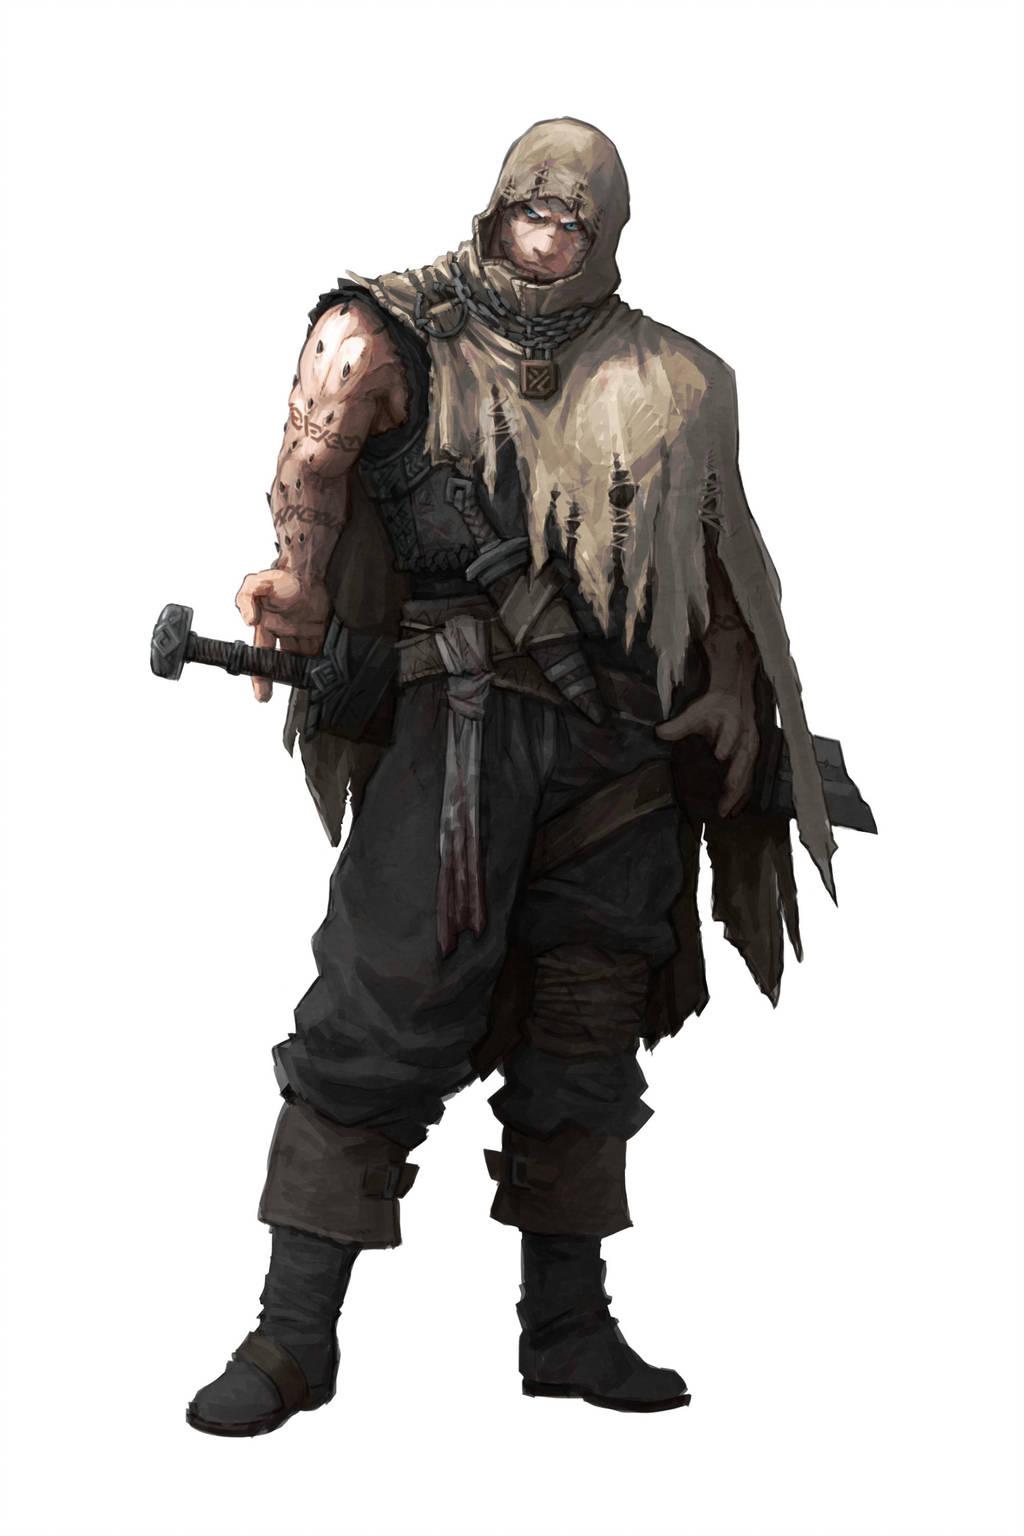 character_concept_art__warrior_by_kenji893_da833xj-fullview